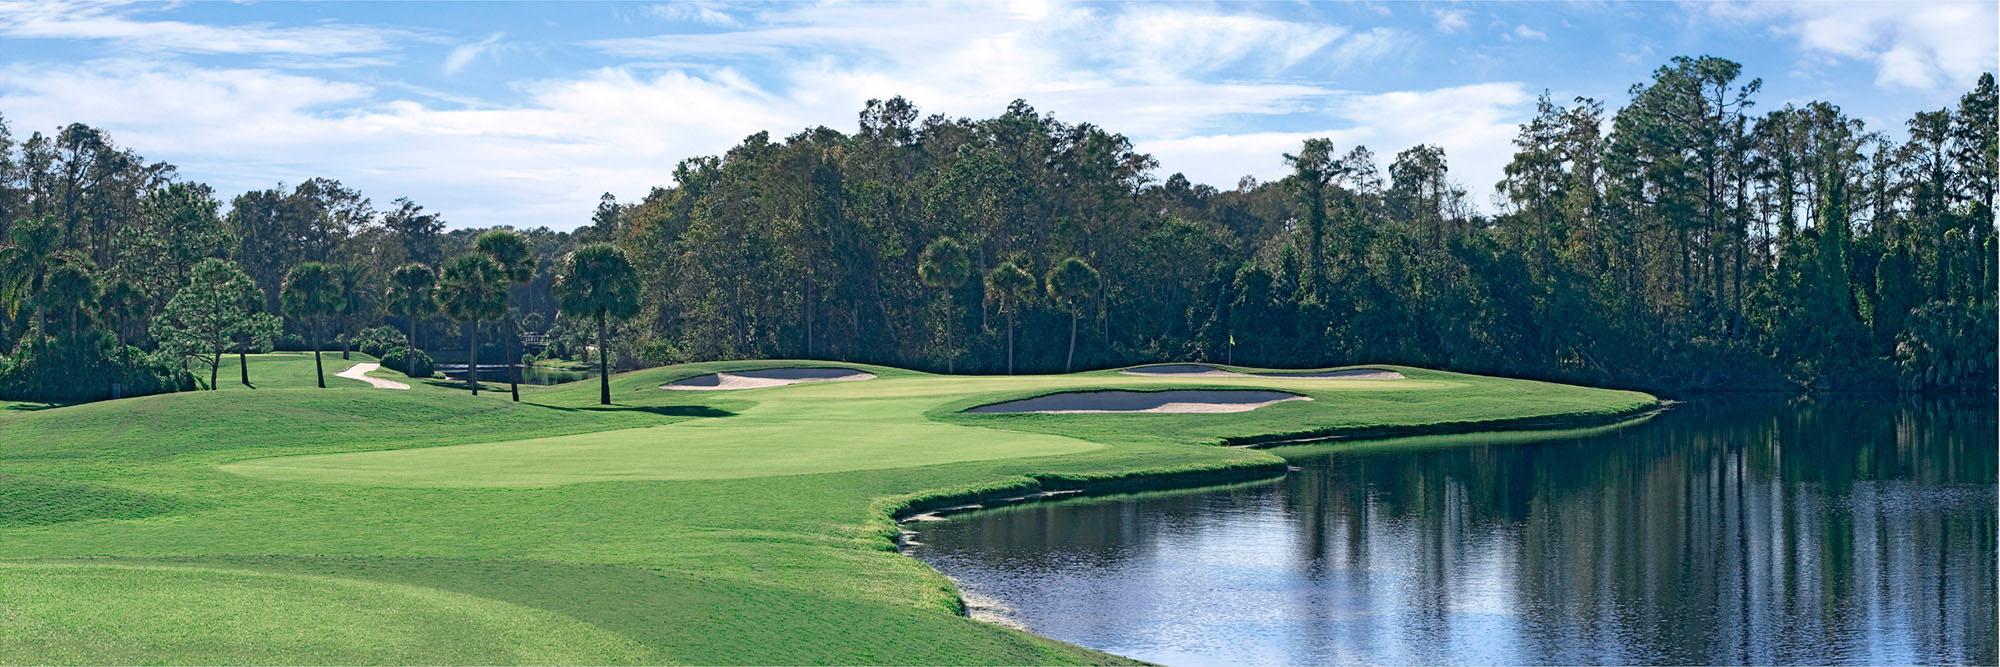 Golf Course Image - Disney's Palm Course No. 3